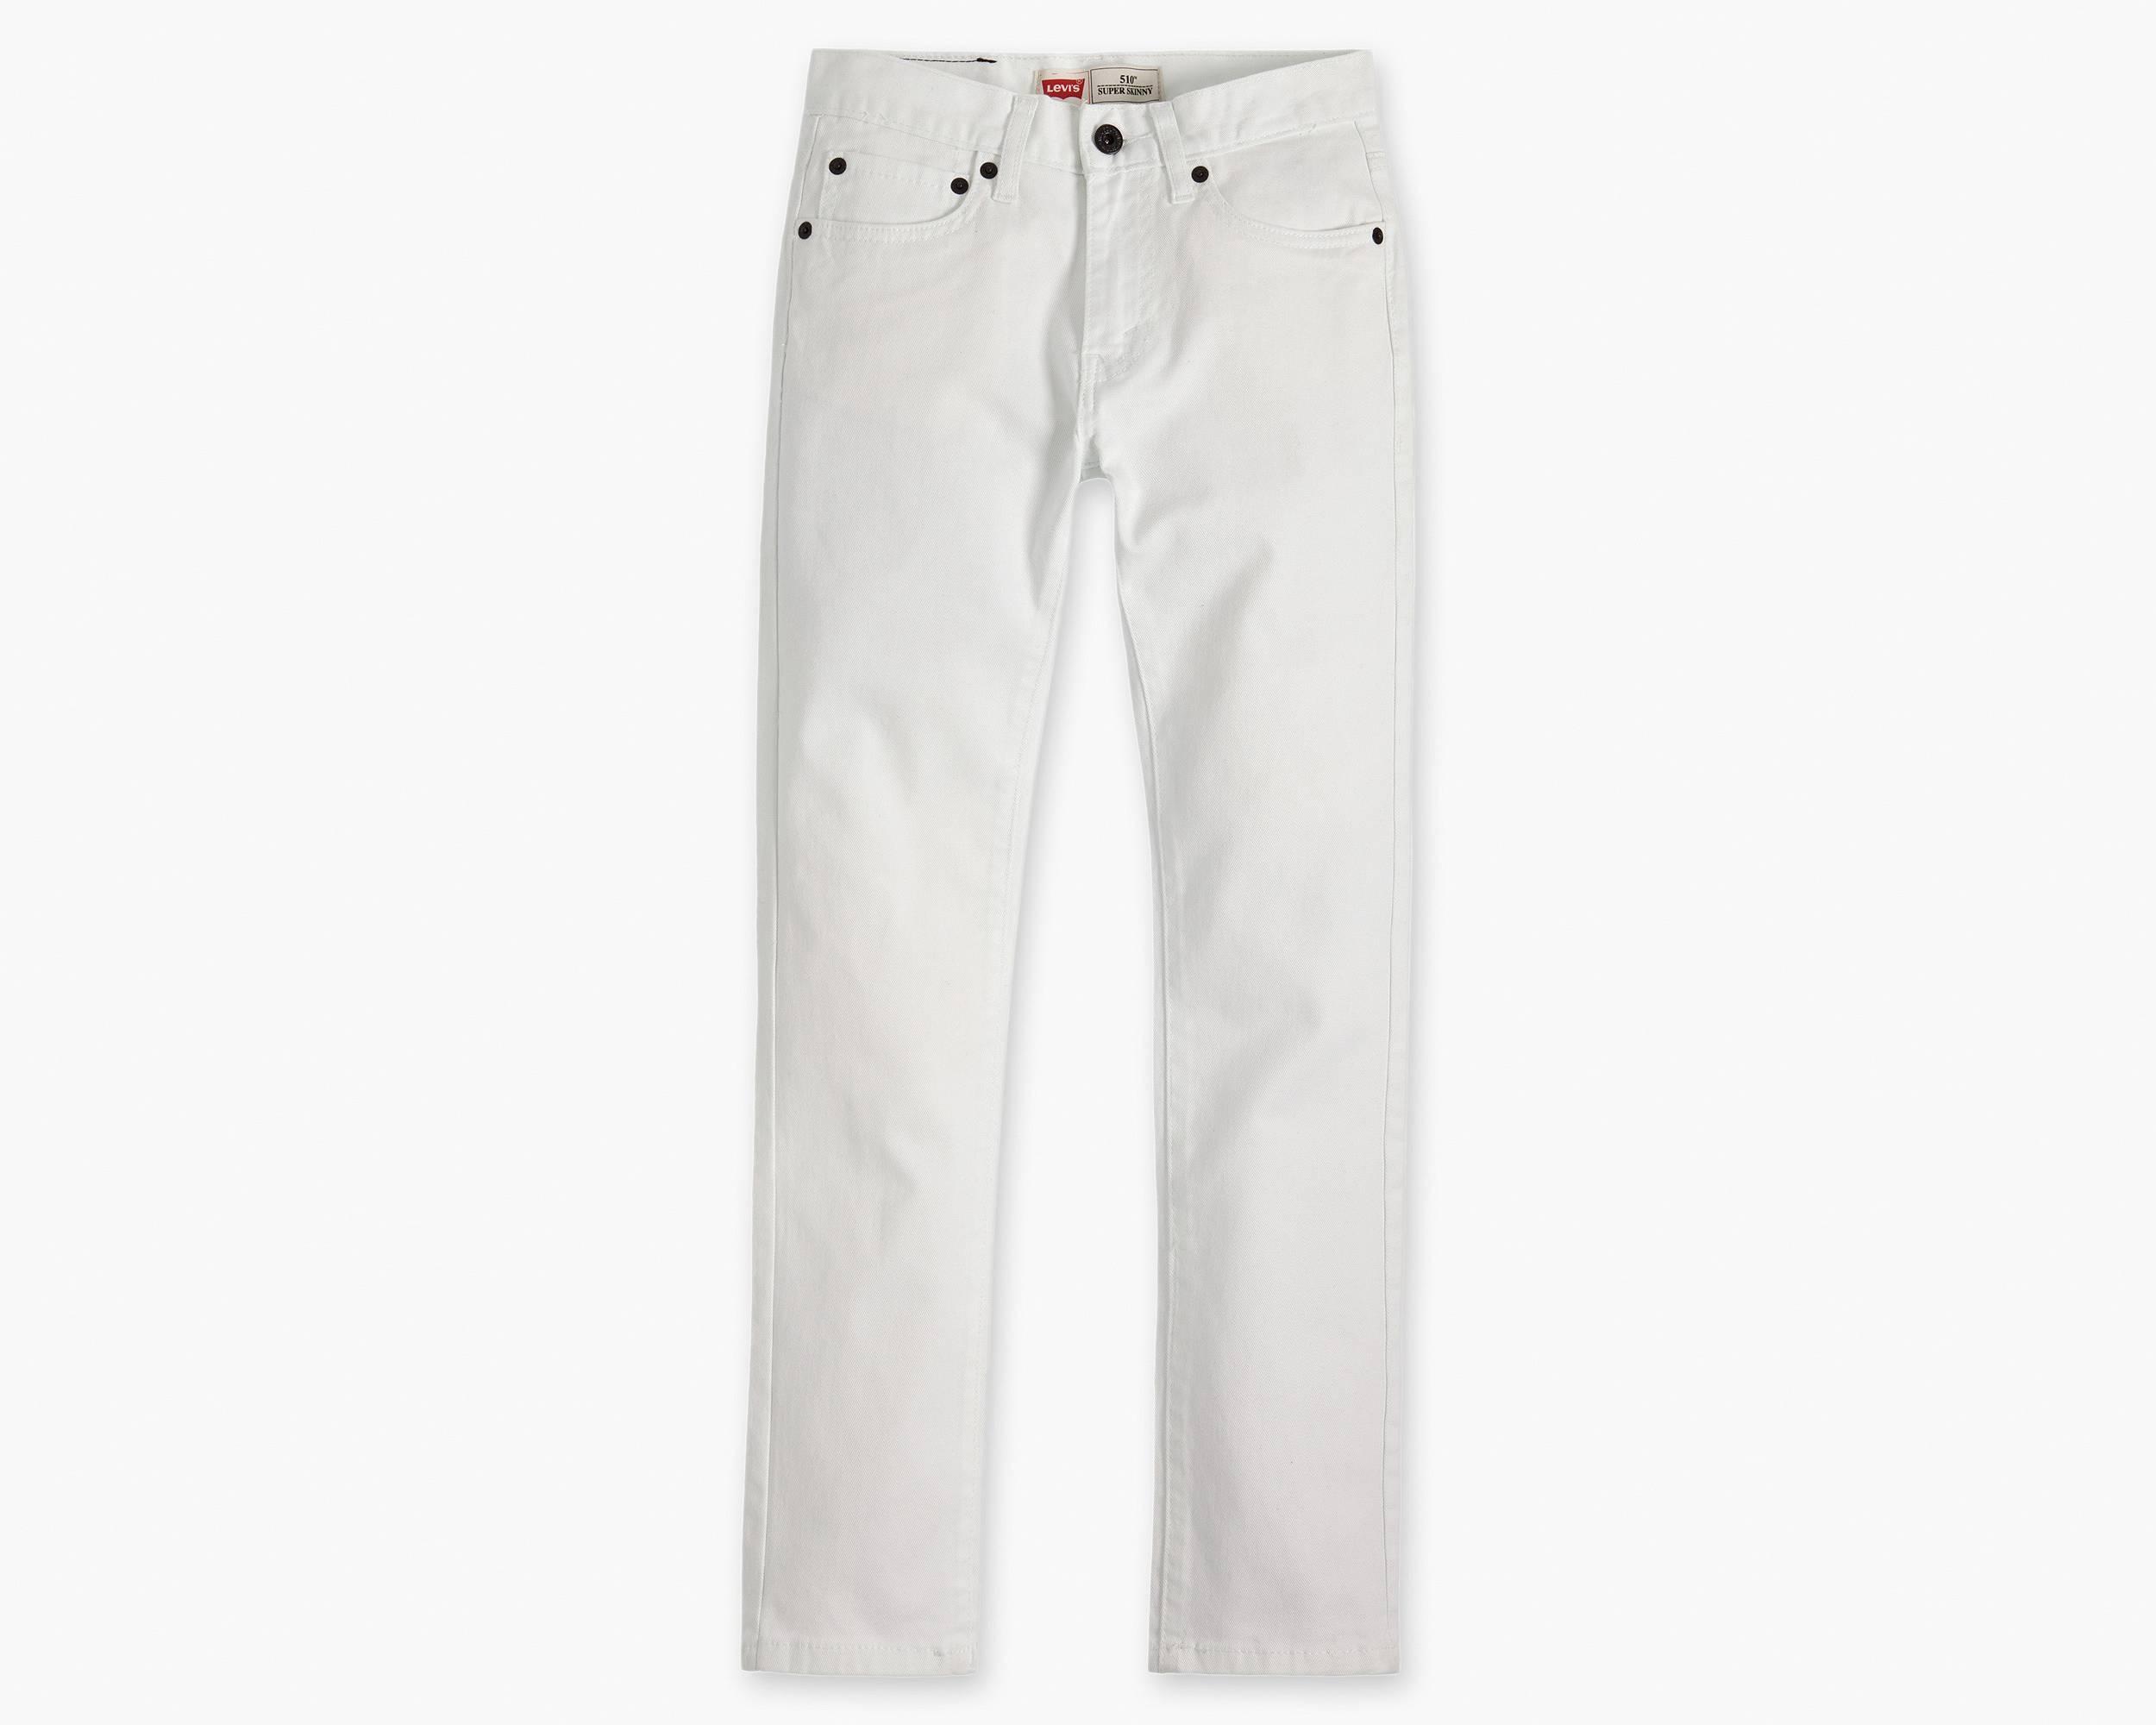 White Skinny Jeans Boys - Jon Jean